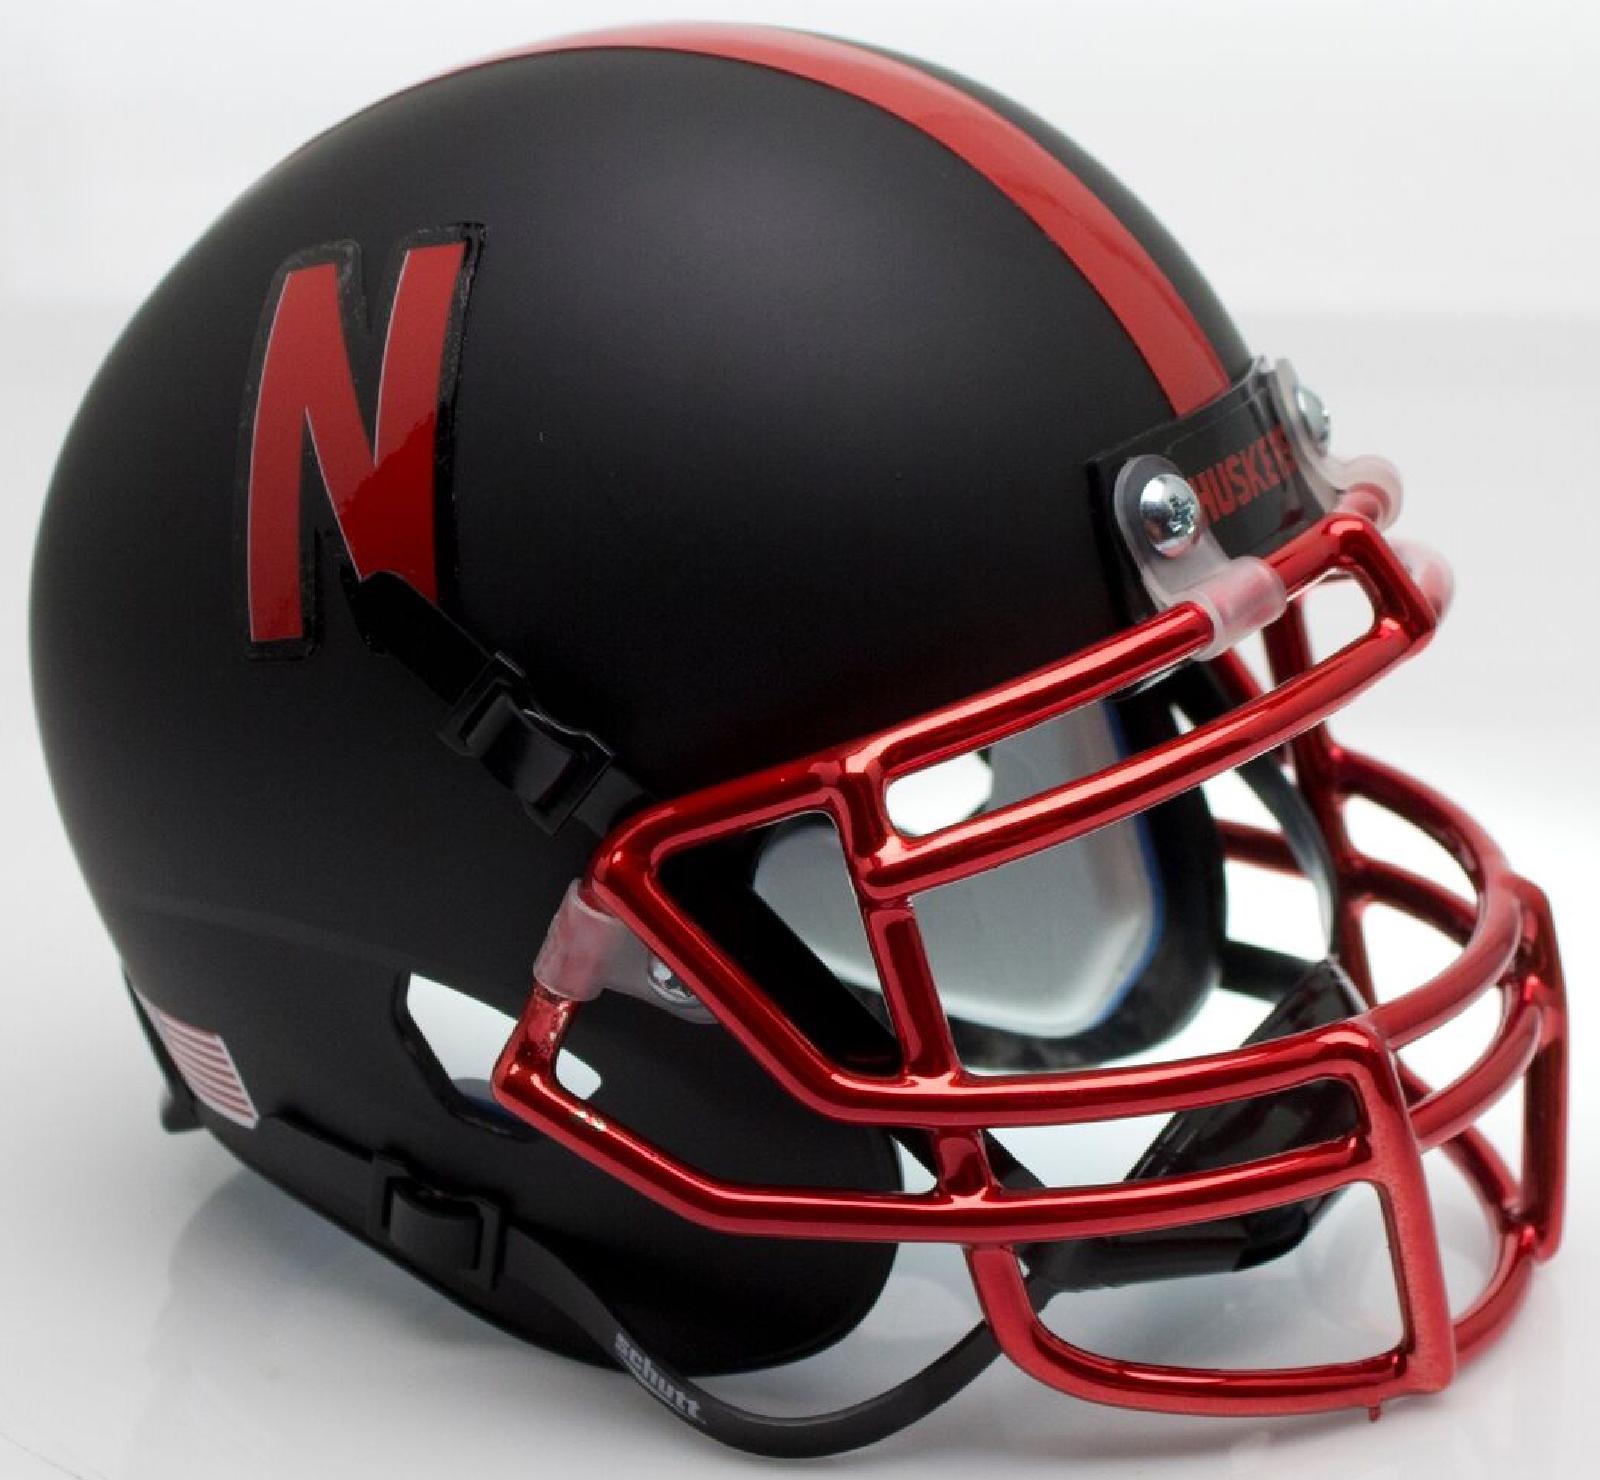 Nebraska Cornhuskers Authentic College XP Football Helmet Schutt <B>Chrome Mask</B>